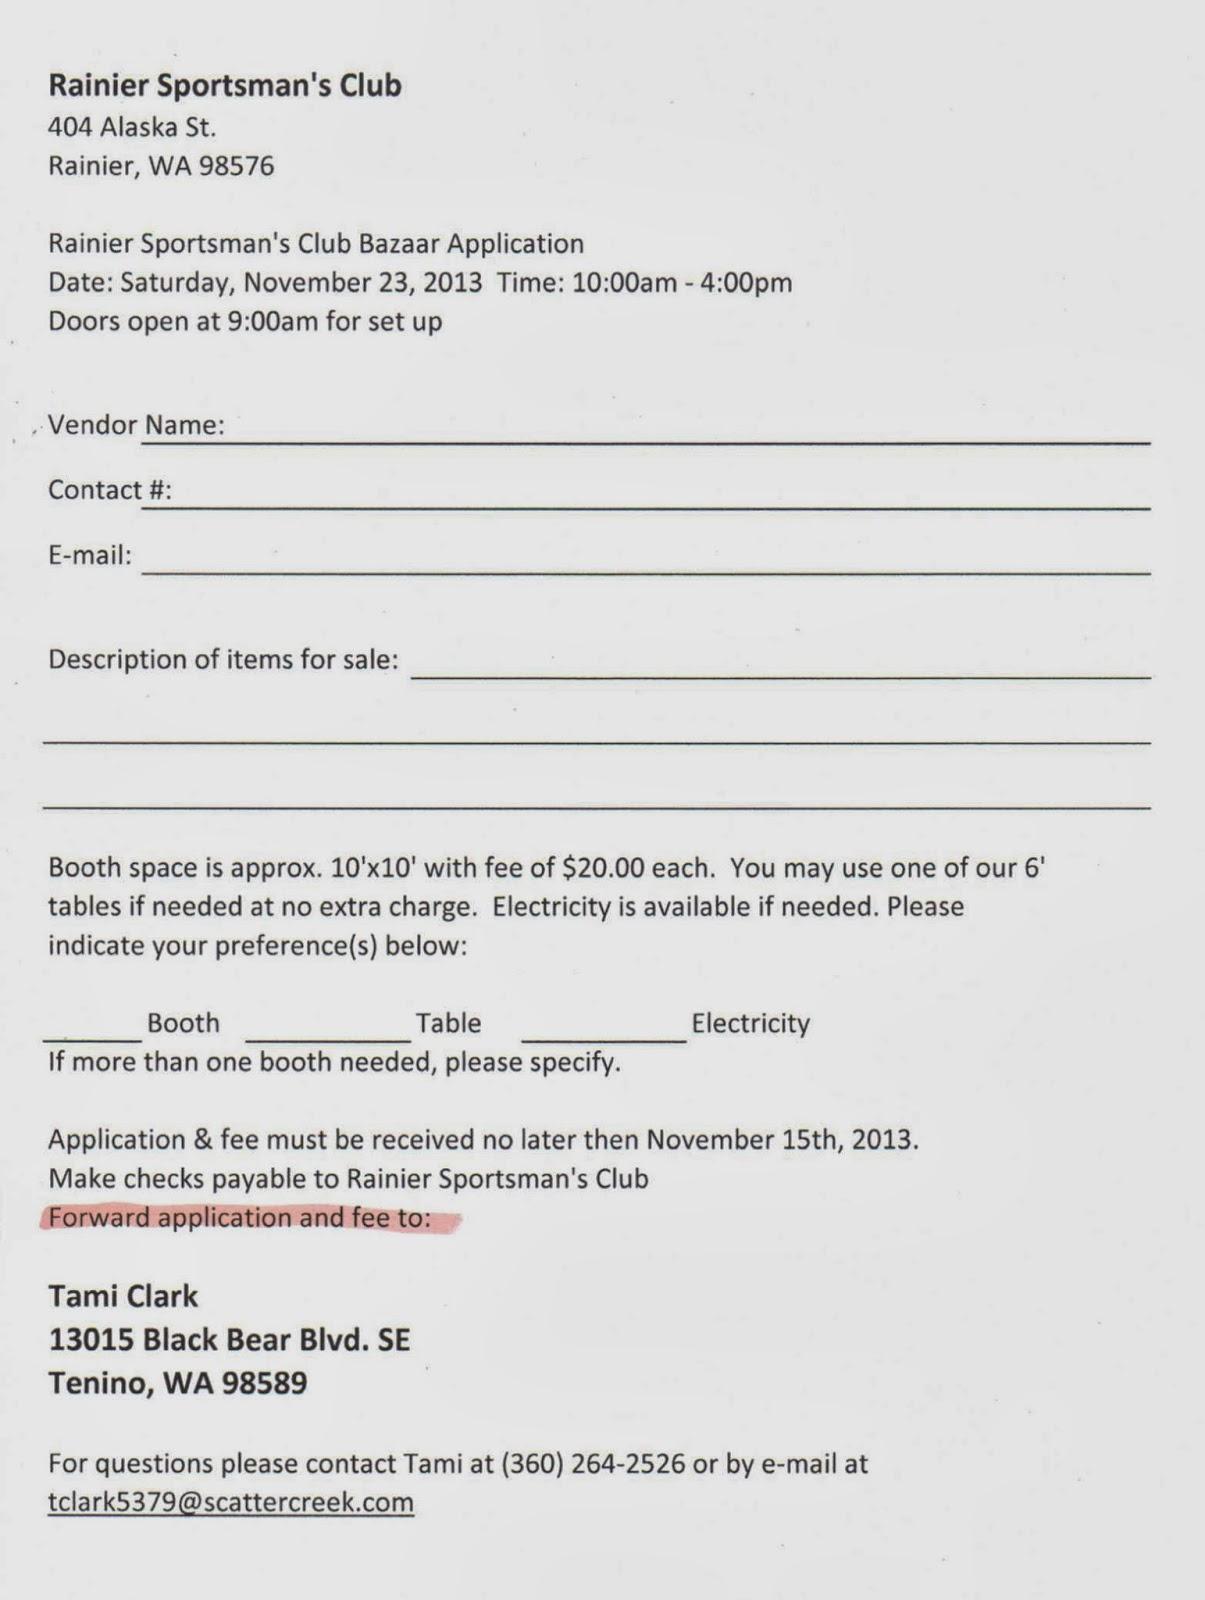 Rainier Lions Club Sportsman S Club Bazaar Vendors Needed